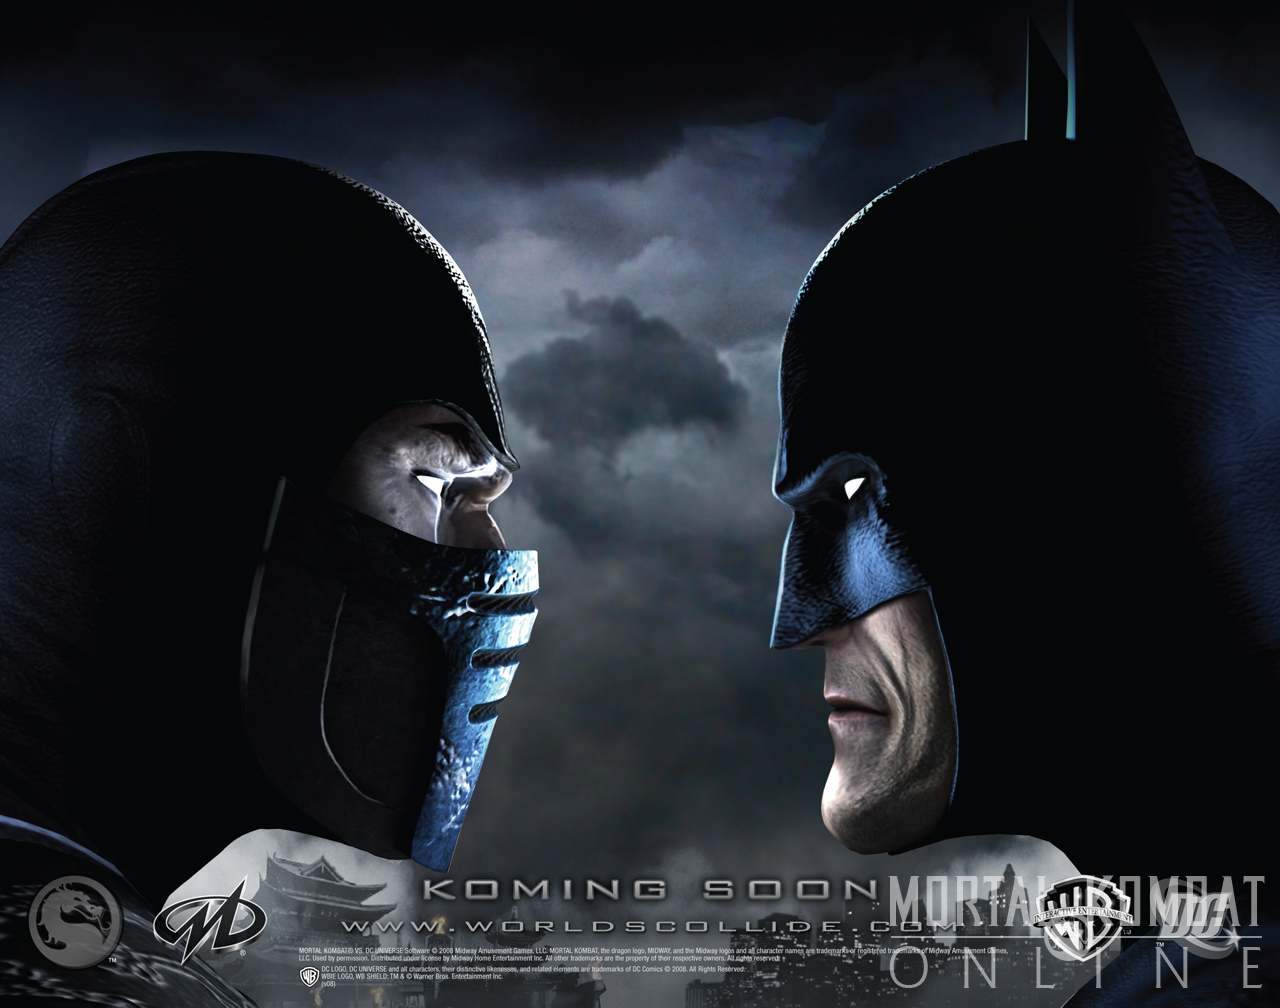 http://www.videogamesblogger.com/wp-content/uploads/2008/04/mortal-kombat-vs-dc-universe-big.jpg